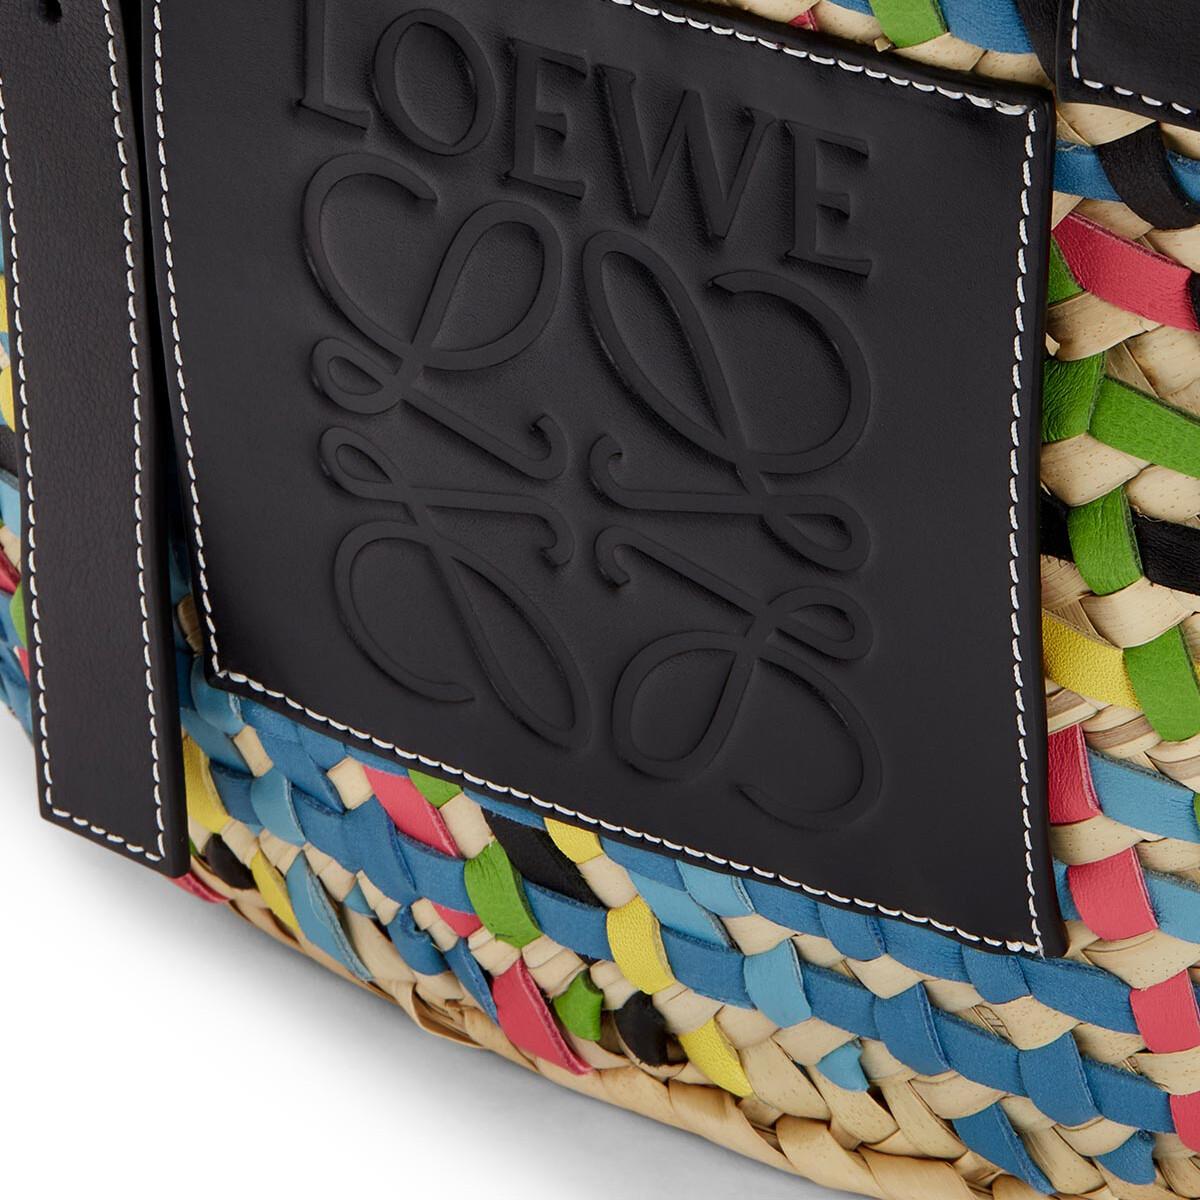 LOEWE Basket Bag Blue Multitone/Black front